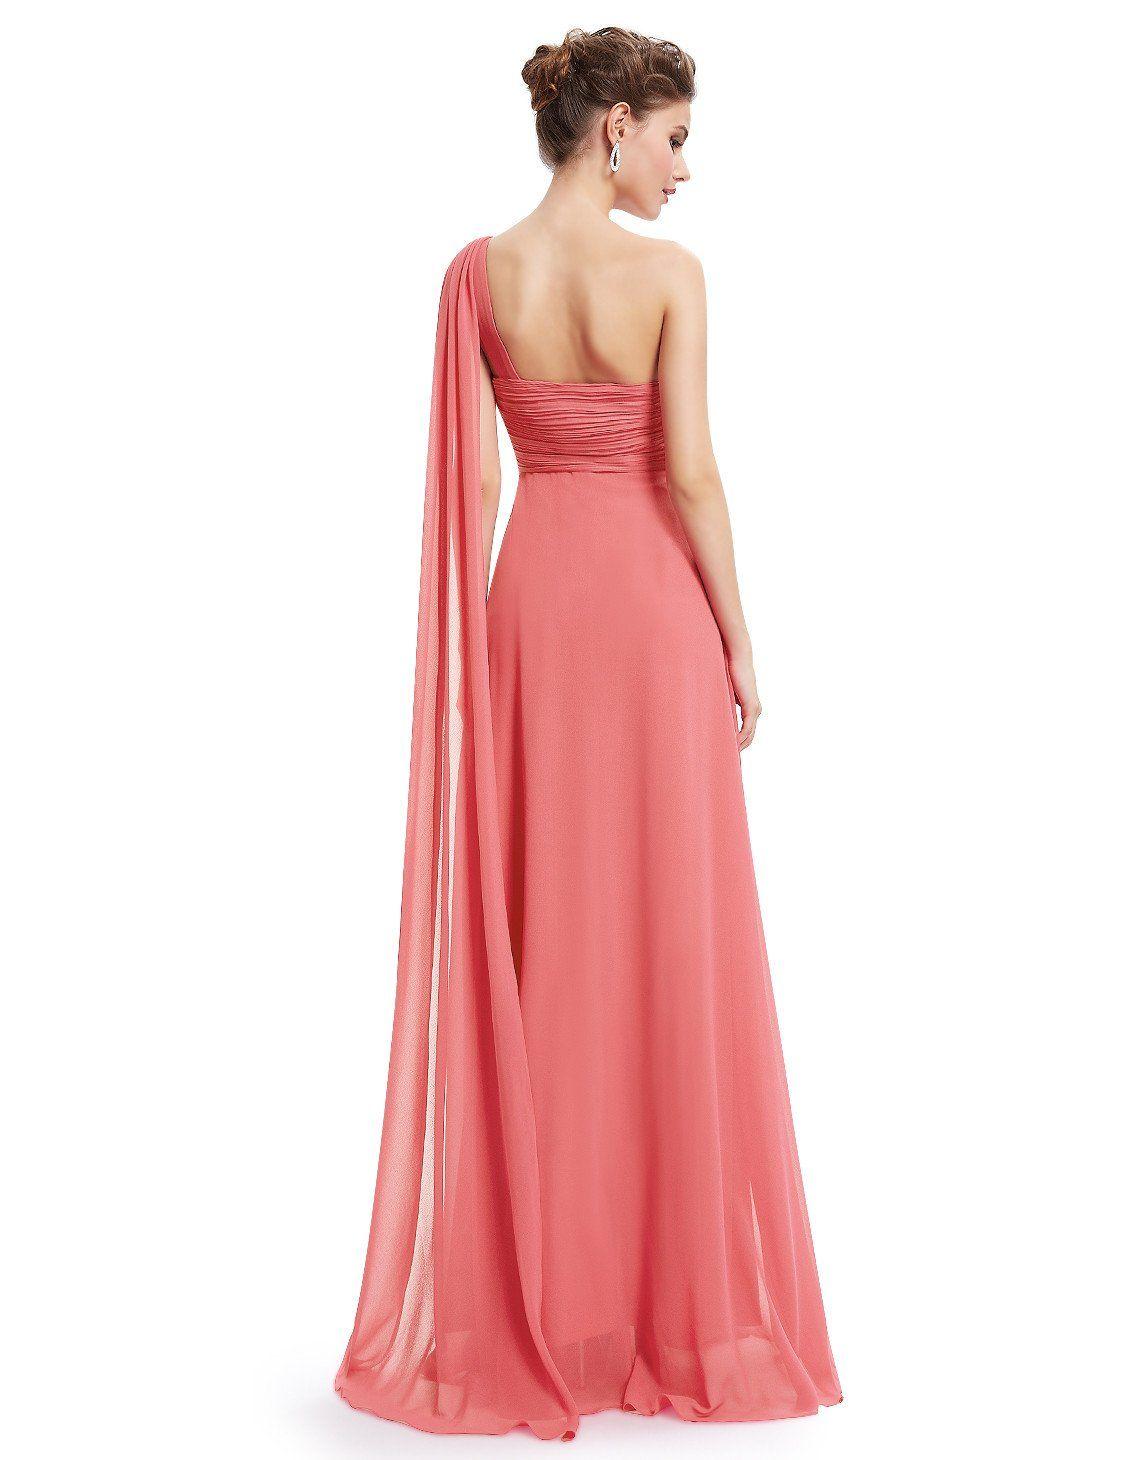 Vestido asimetrico Arelie | Mujer, vestido rosa | Pinterest ...